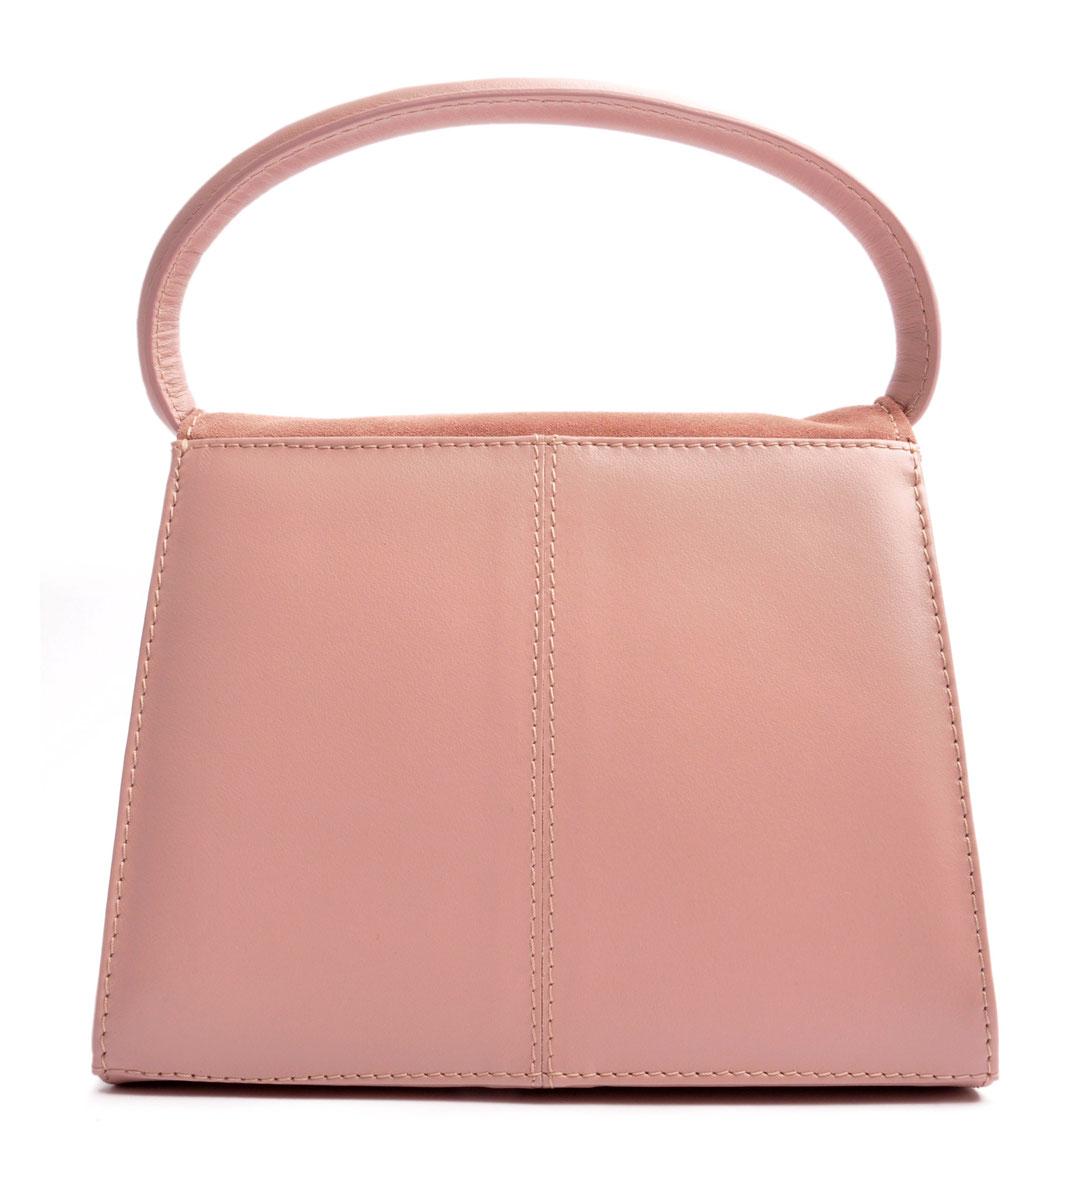 Tracht Trachtentasche  Leder rosa . Handgefertigt . OSTWALD Traditional Craft